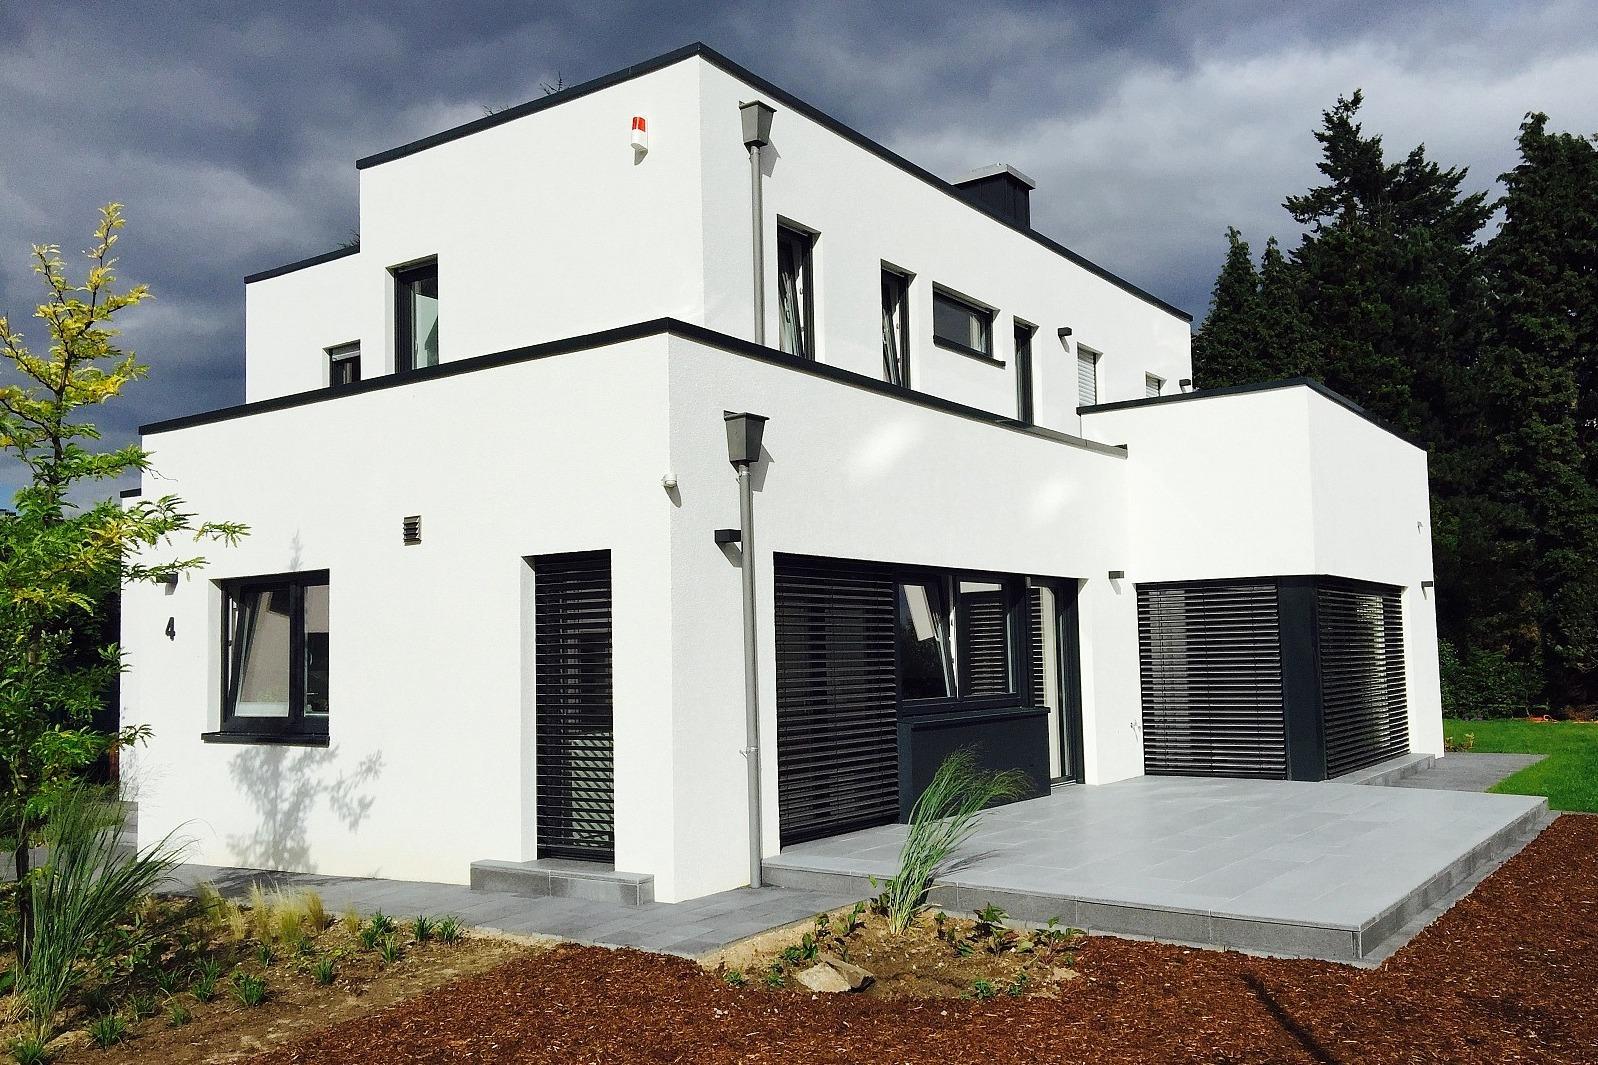 sonnenweg krefeld architekturb ro neuhoff krefeld. Black Bedroom Furniture Sets. Home Design Ideas